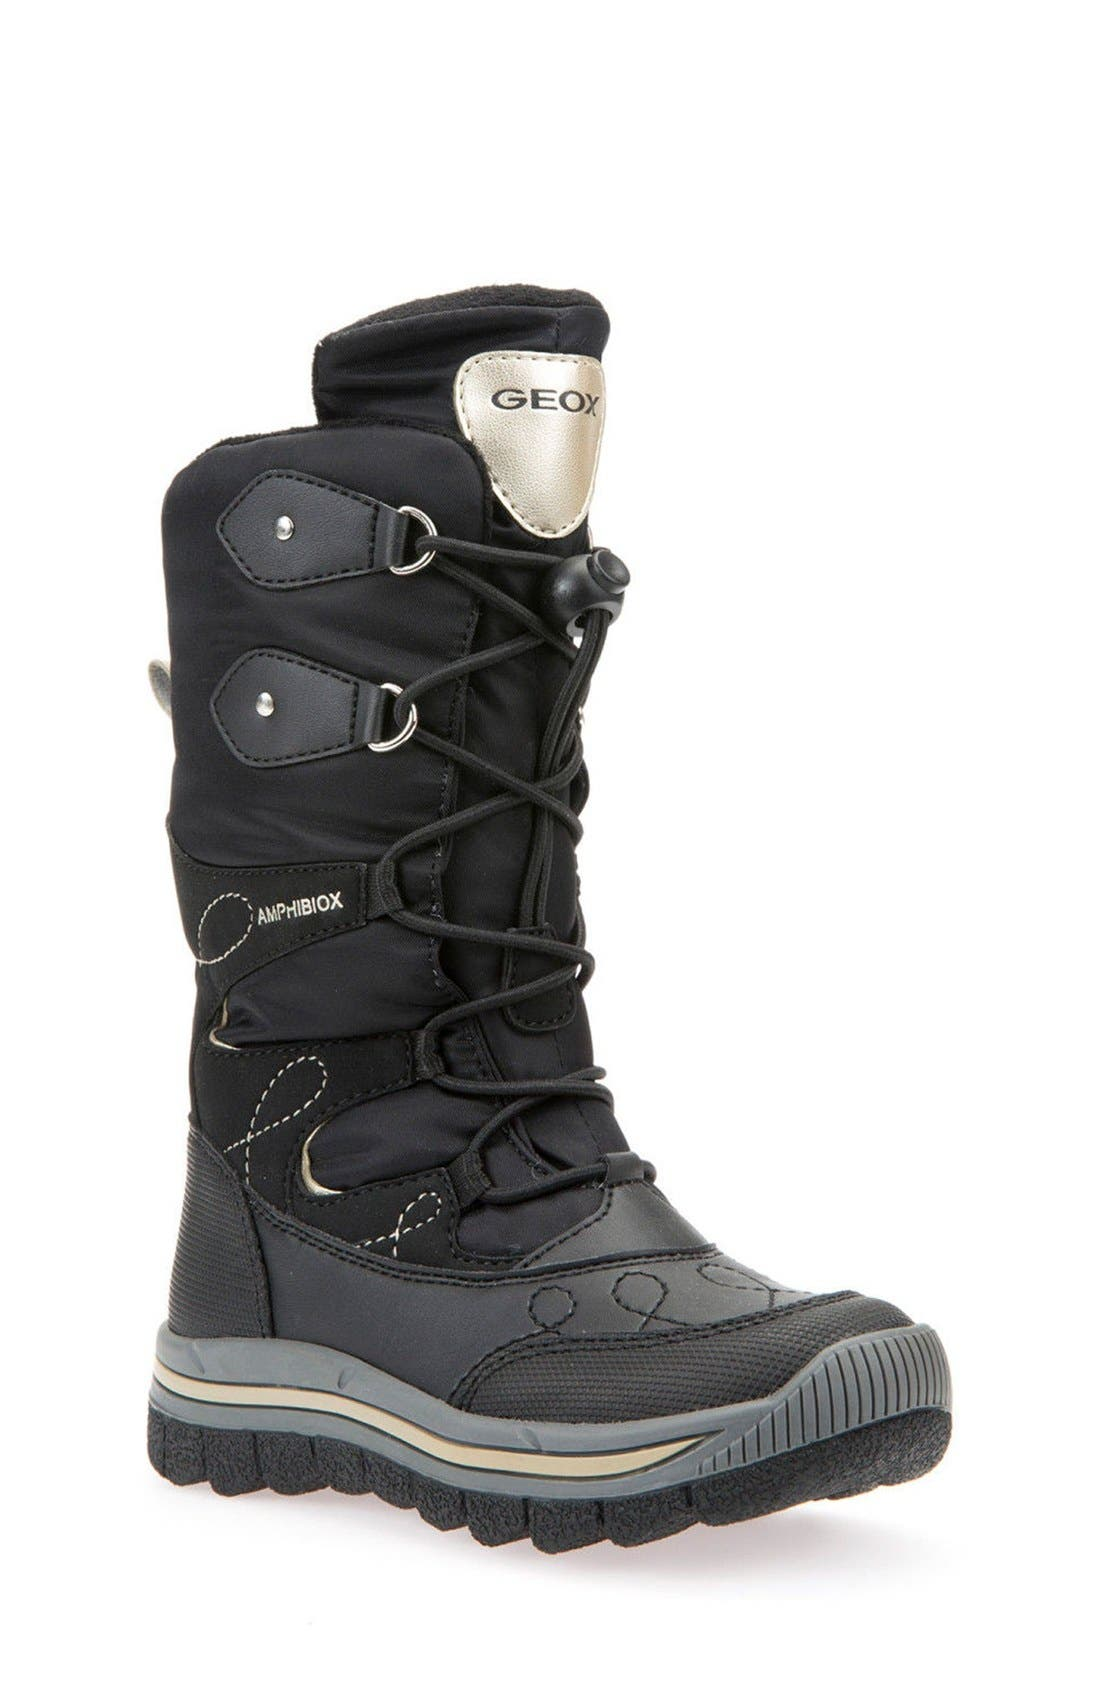 GEOX 'Overland ABX' Waterproof Boot